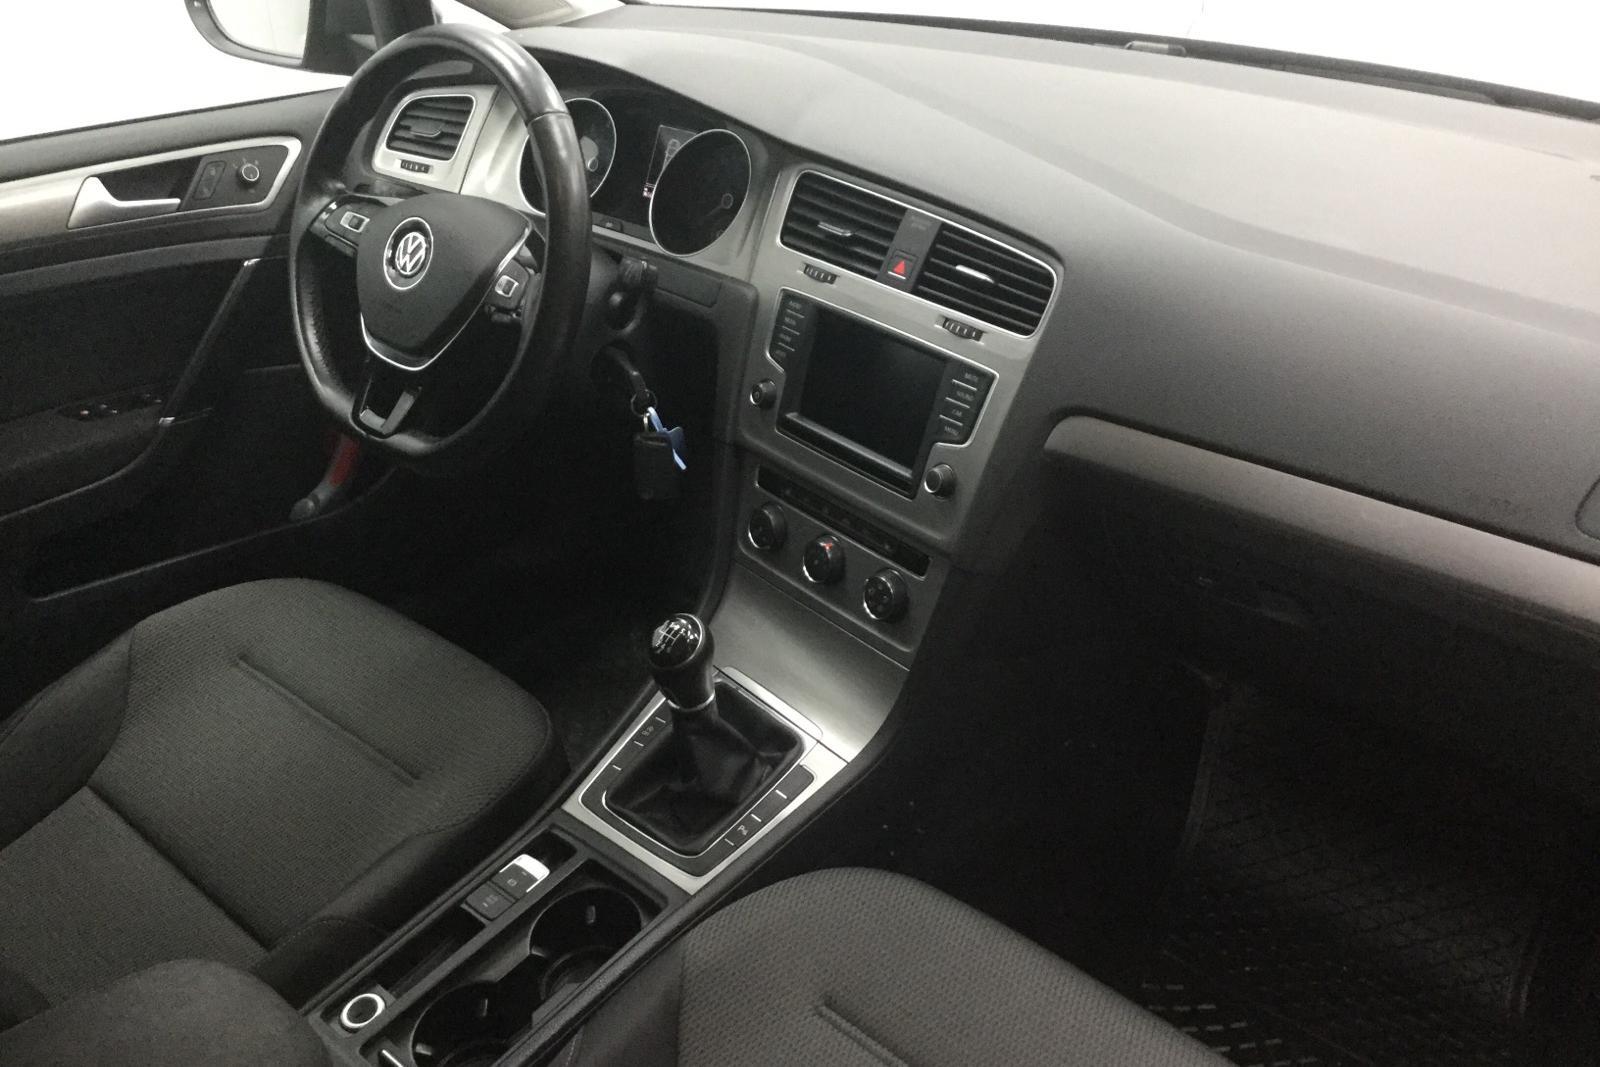 VW Golf VII 1.4 TSI Multifuel 5dr (125hk) - 0 mil - Manuell - grå - 2016